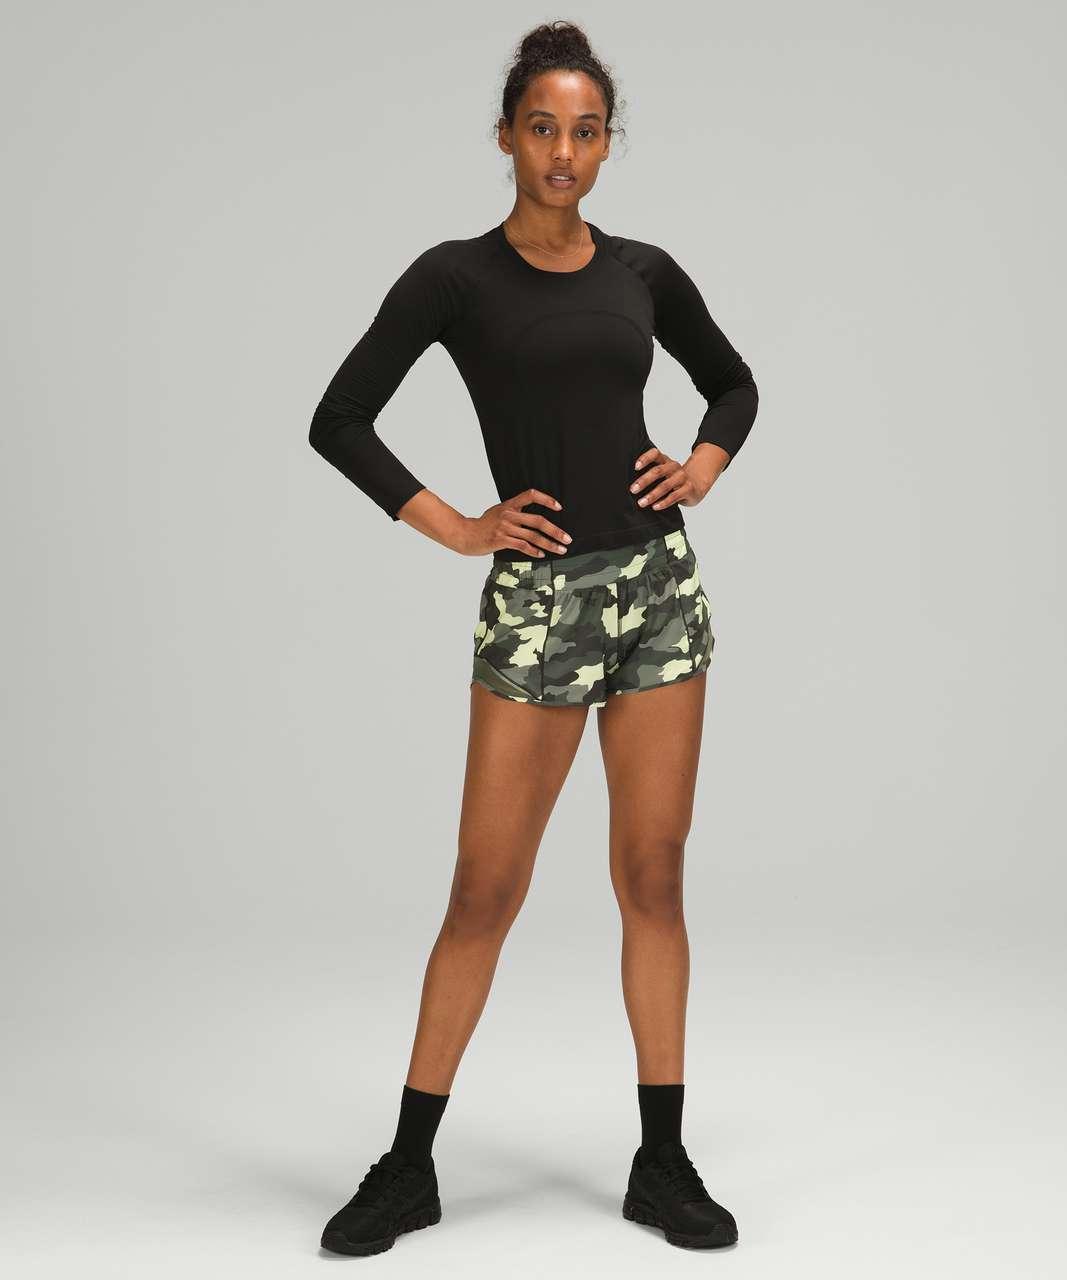 "Lululemon Hotty Hot Low-Rise Short 2.5"" - Heritage 365 Camo Crispin Green Multi / Medium Olive"